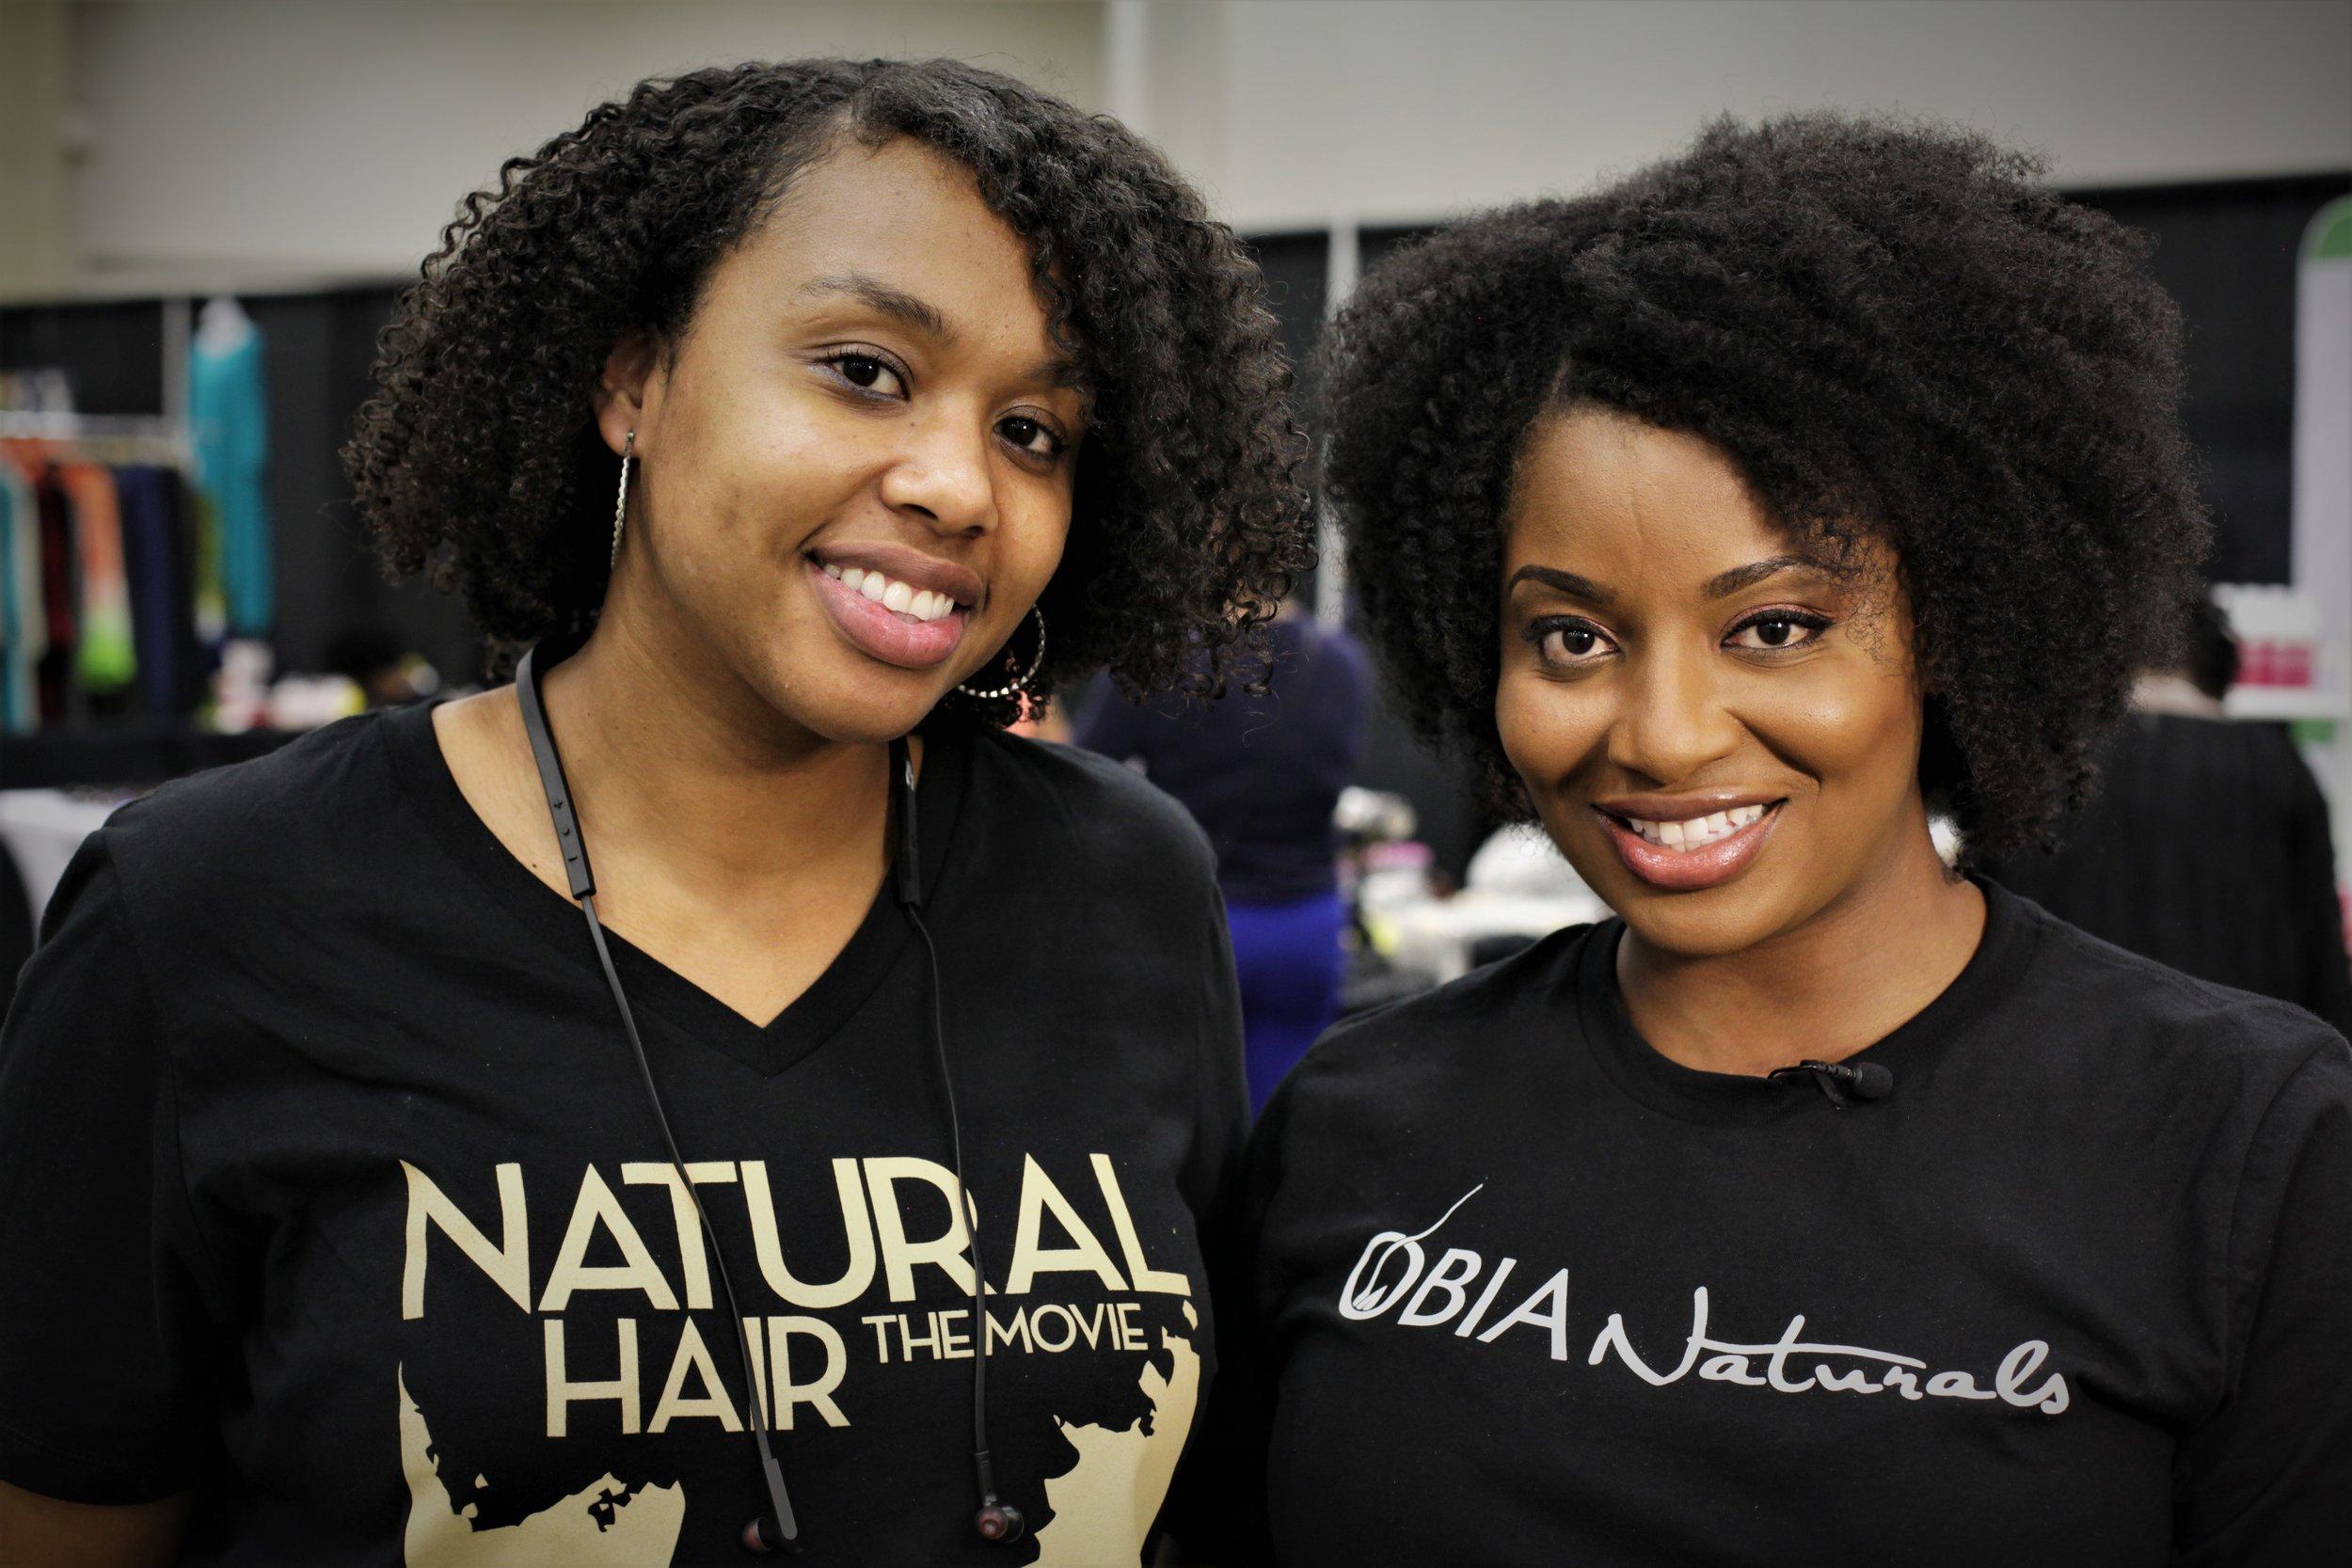 Natural Hair The Movie Obia Naturals.jpg